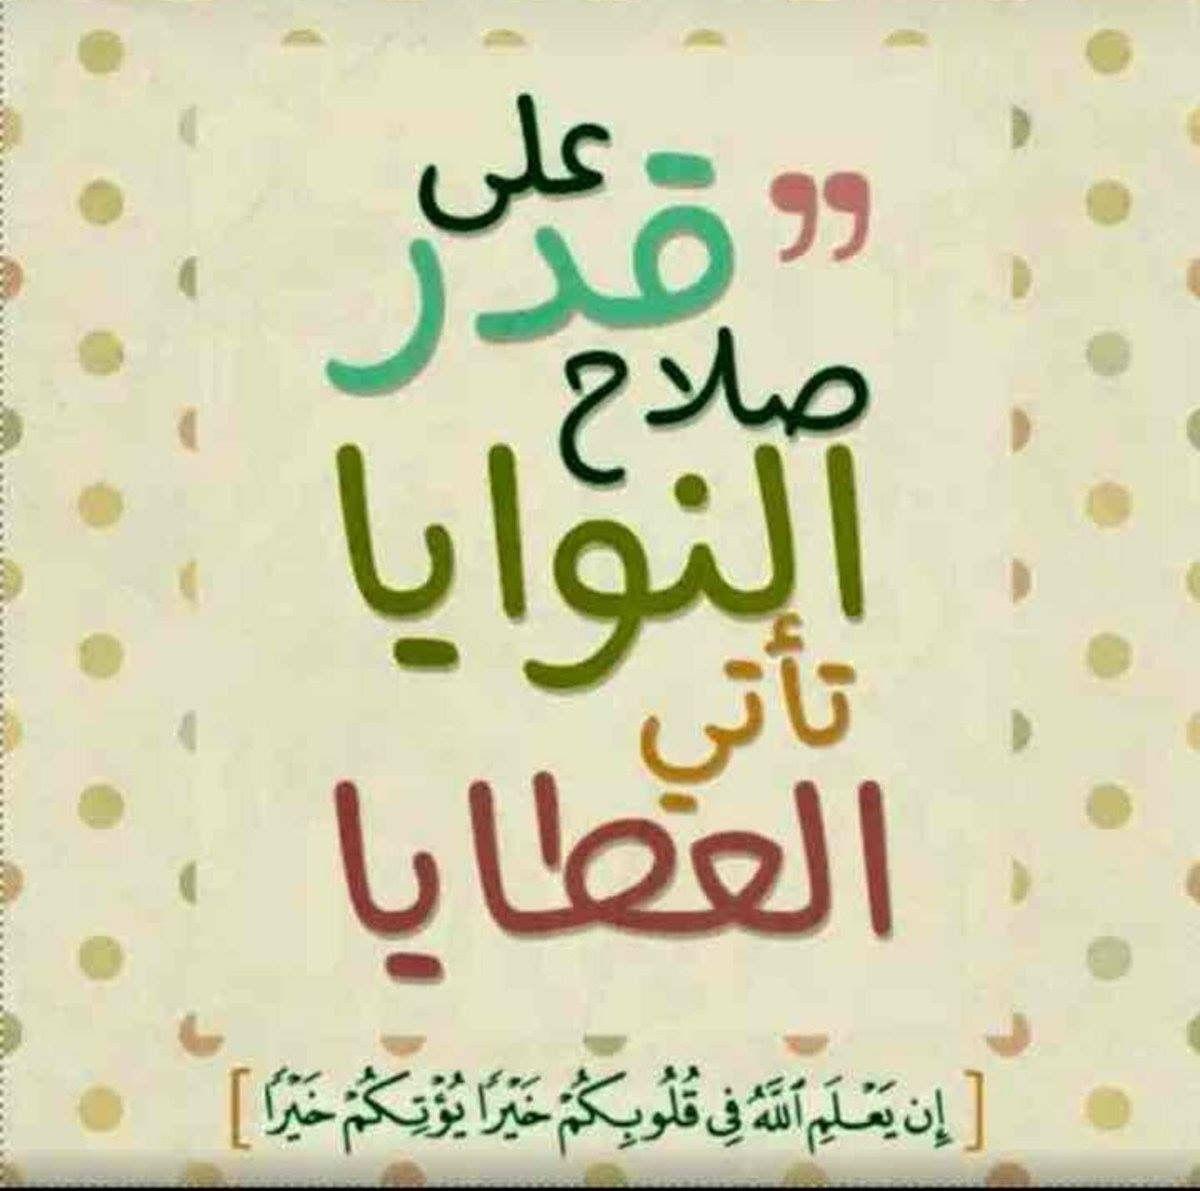 Pin By تدبروا القرآن الكريم On تدبـــروا حكمــة الله فــي آيــة Arabic Love Quotes Love Quotes Quotes